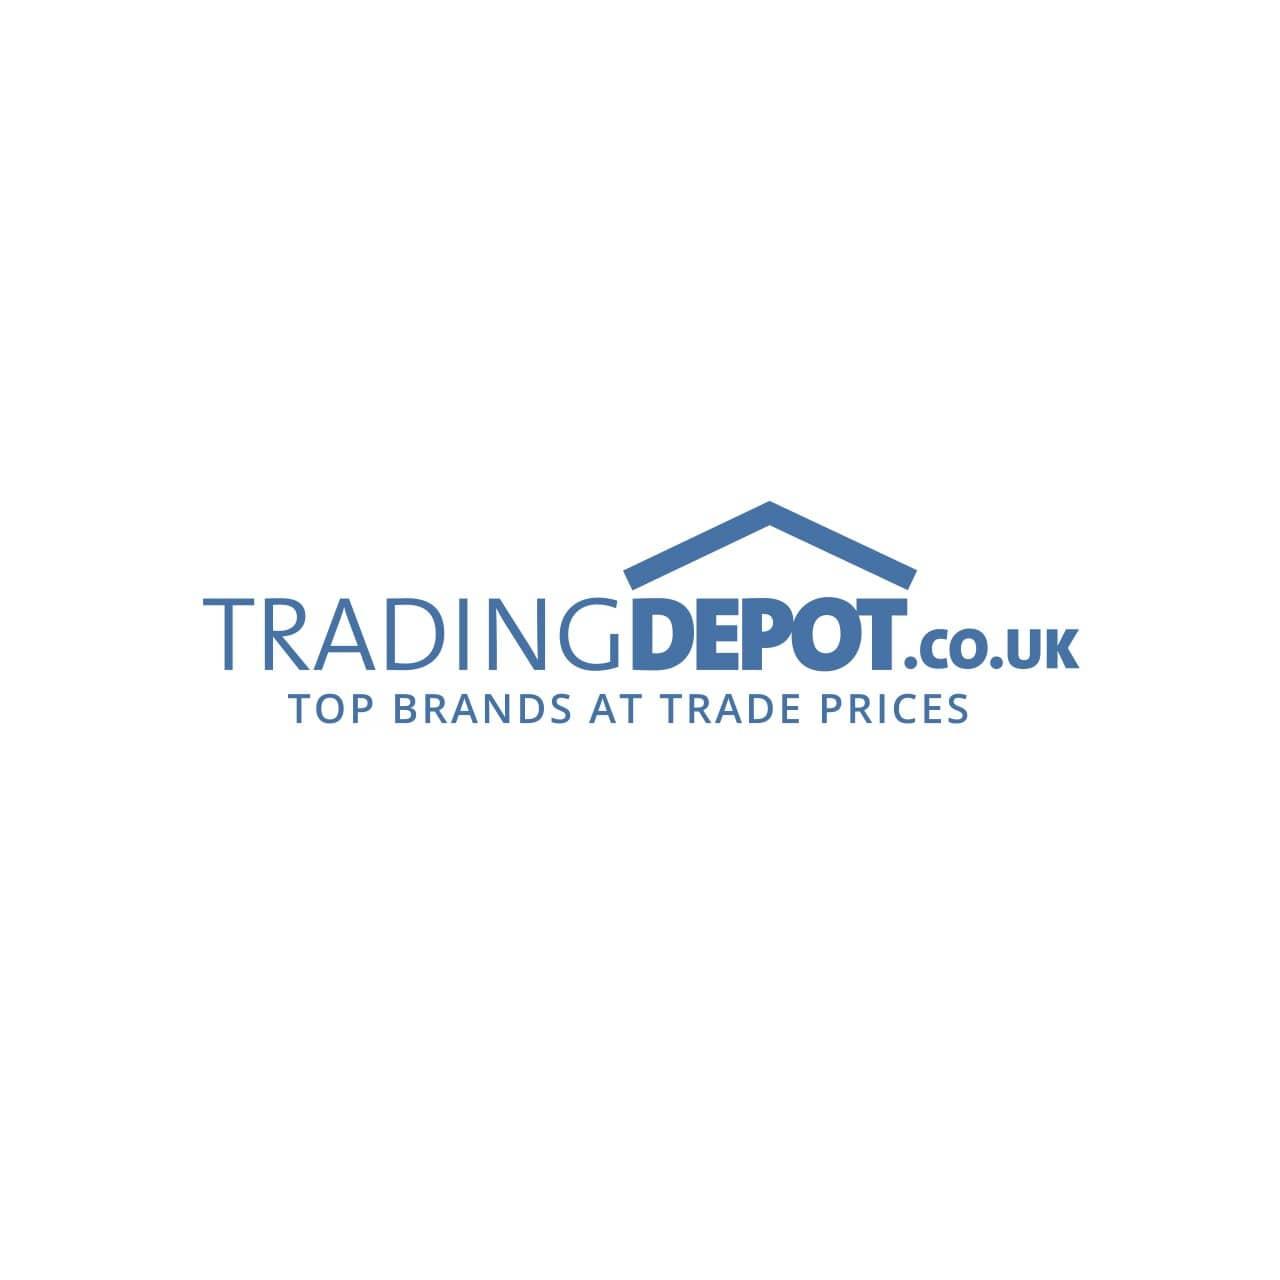 LPD Malton 2L Glazed External Hardwood Door 762x1981x44mm - MALHWDDG30